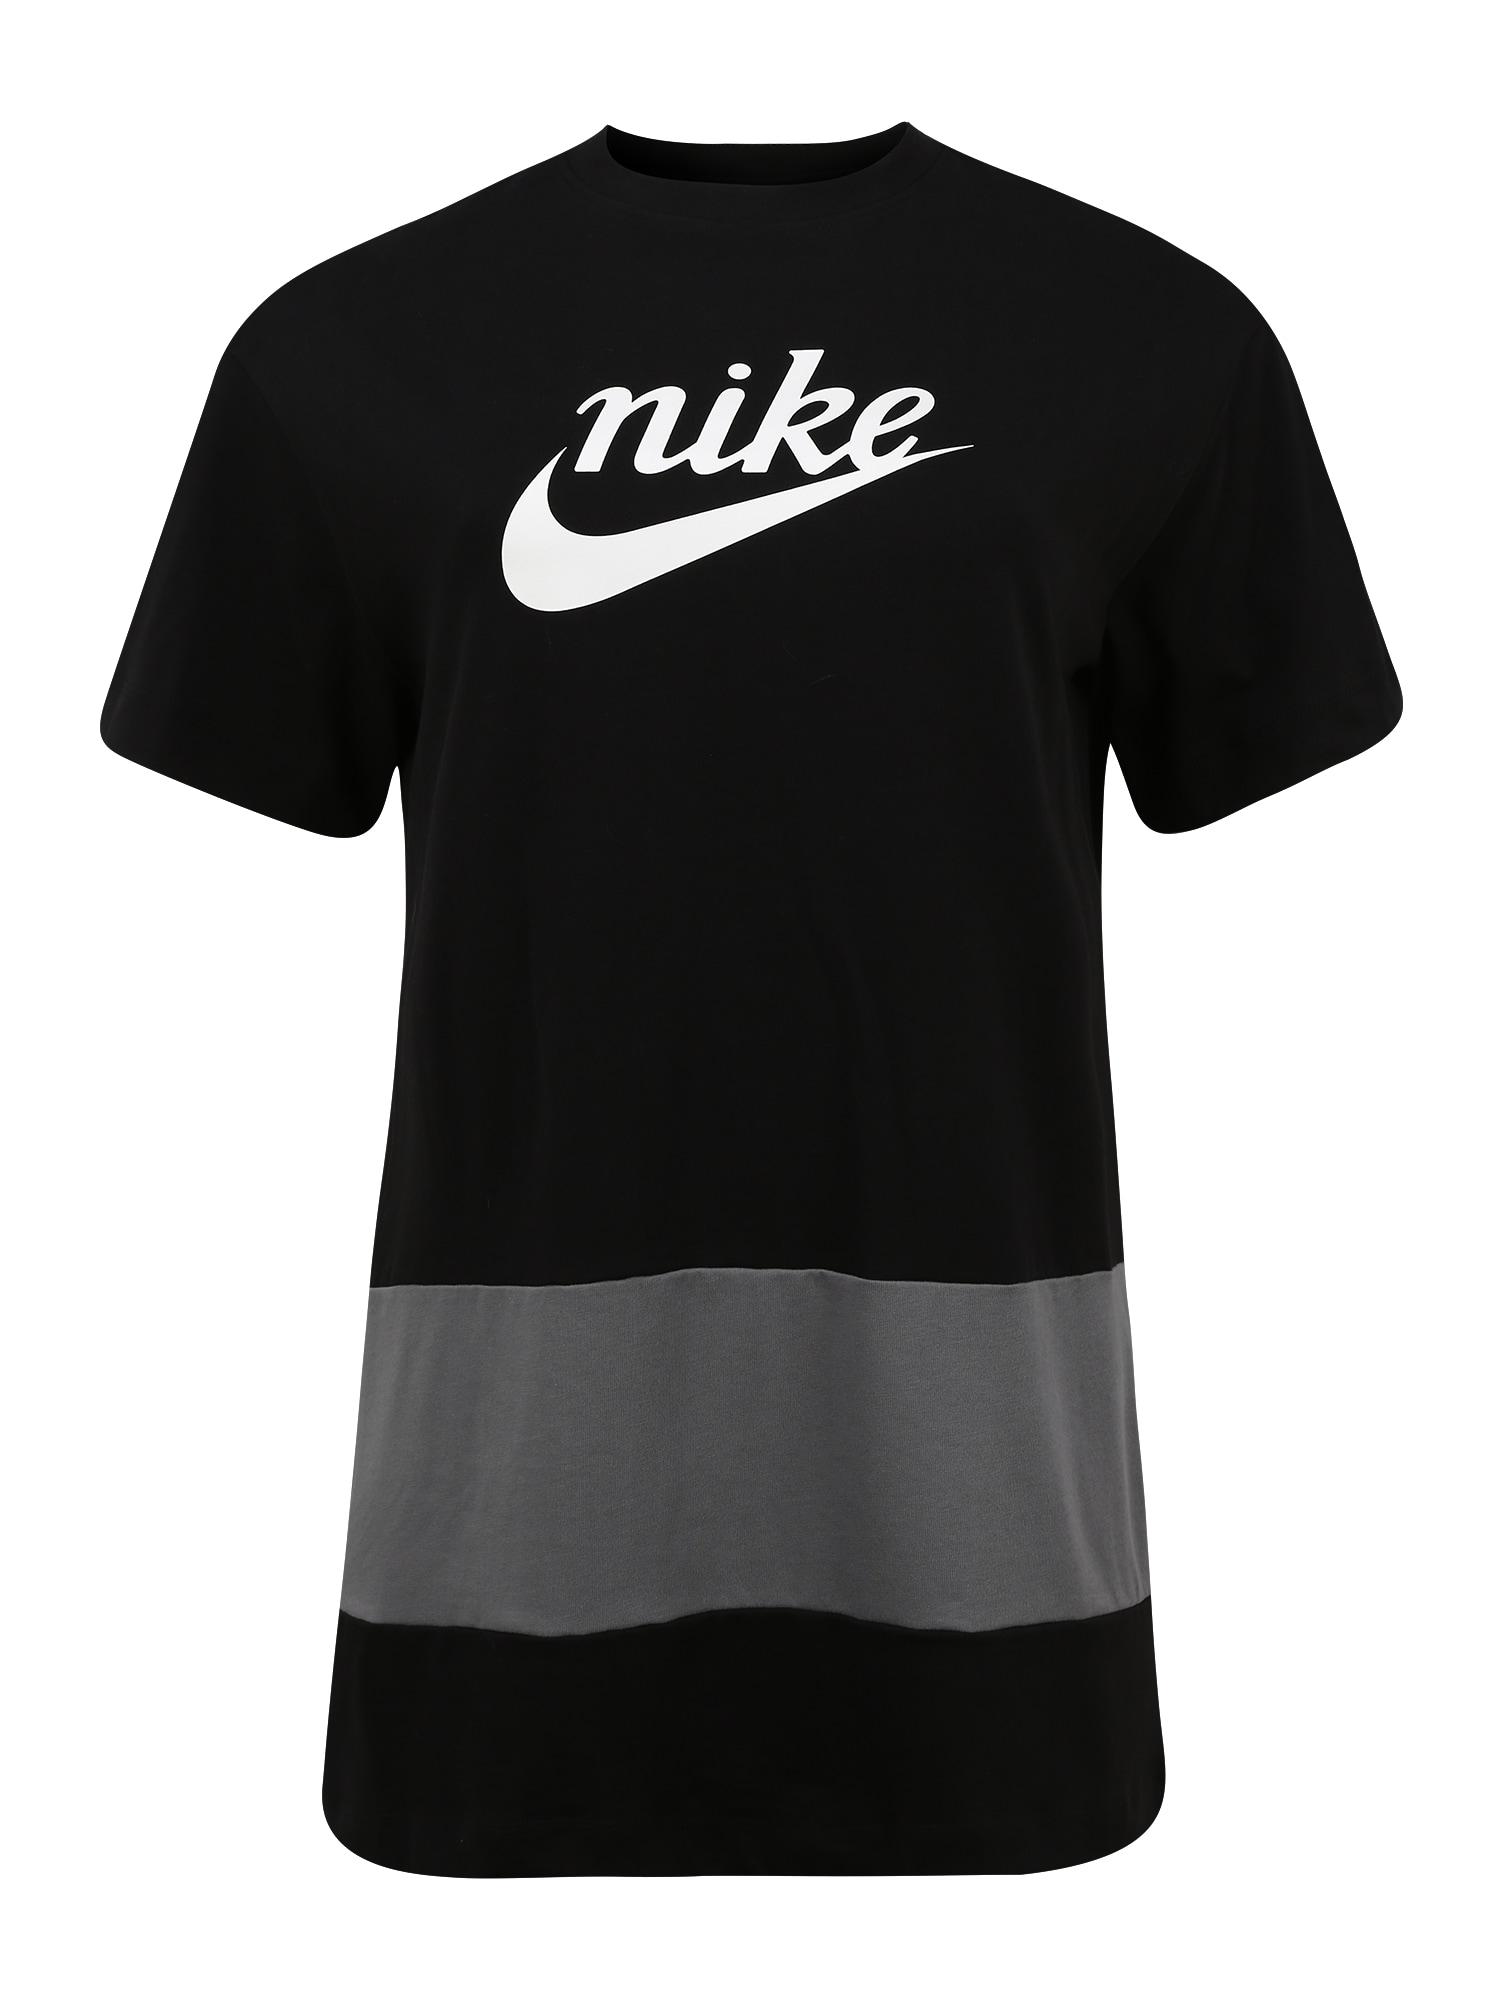 Nike Sportswear Suknelė juoda / balta / pilka